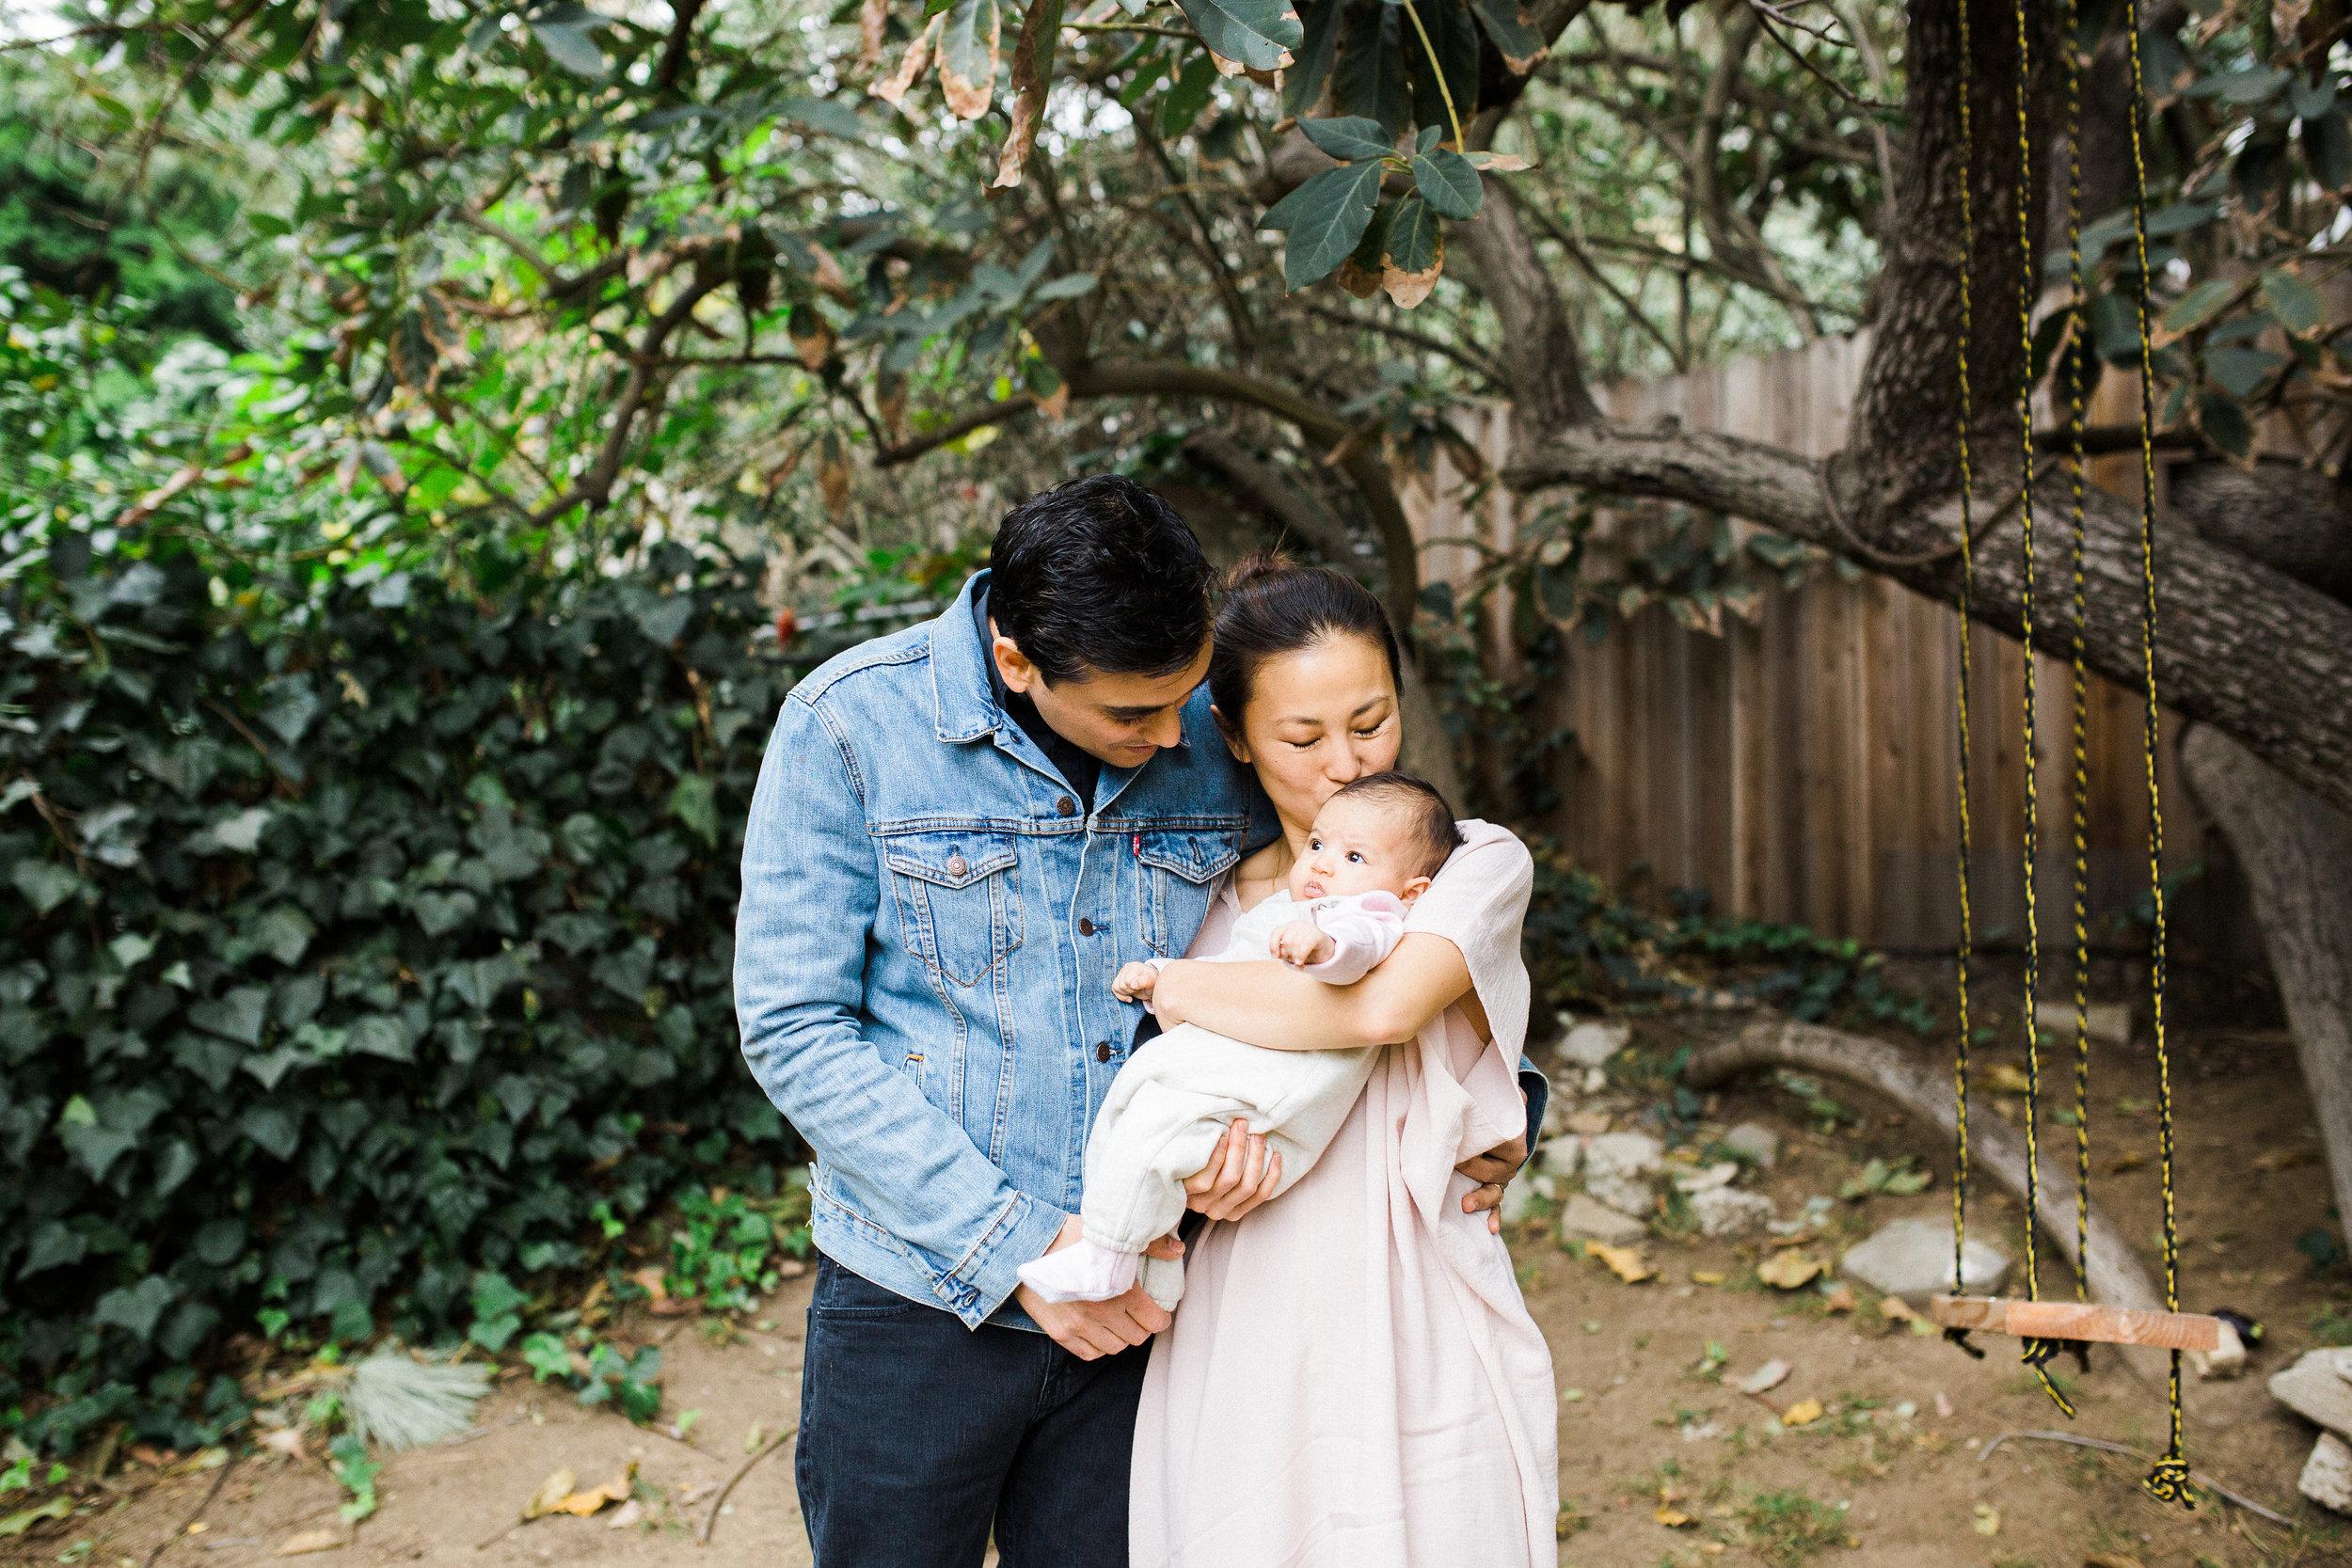 mehana-family-session_la-los-angeles-family-photographer-67.jpg